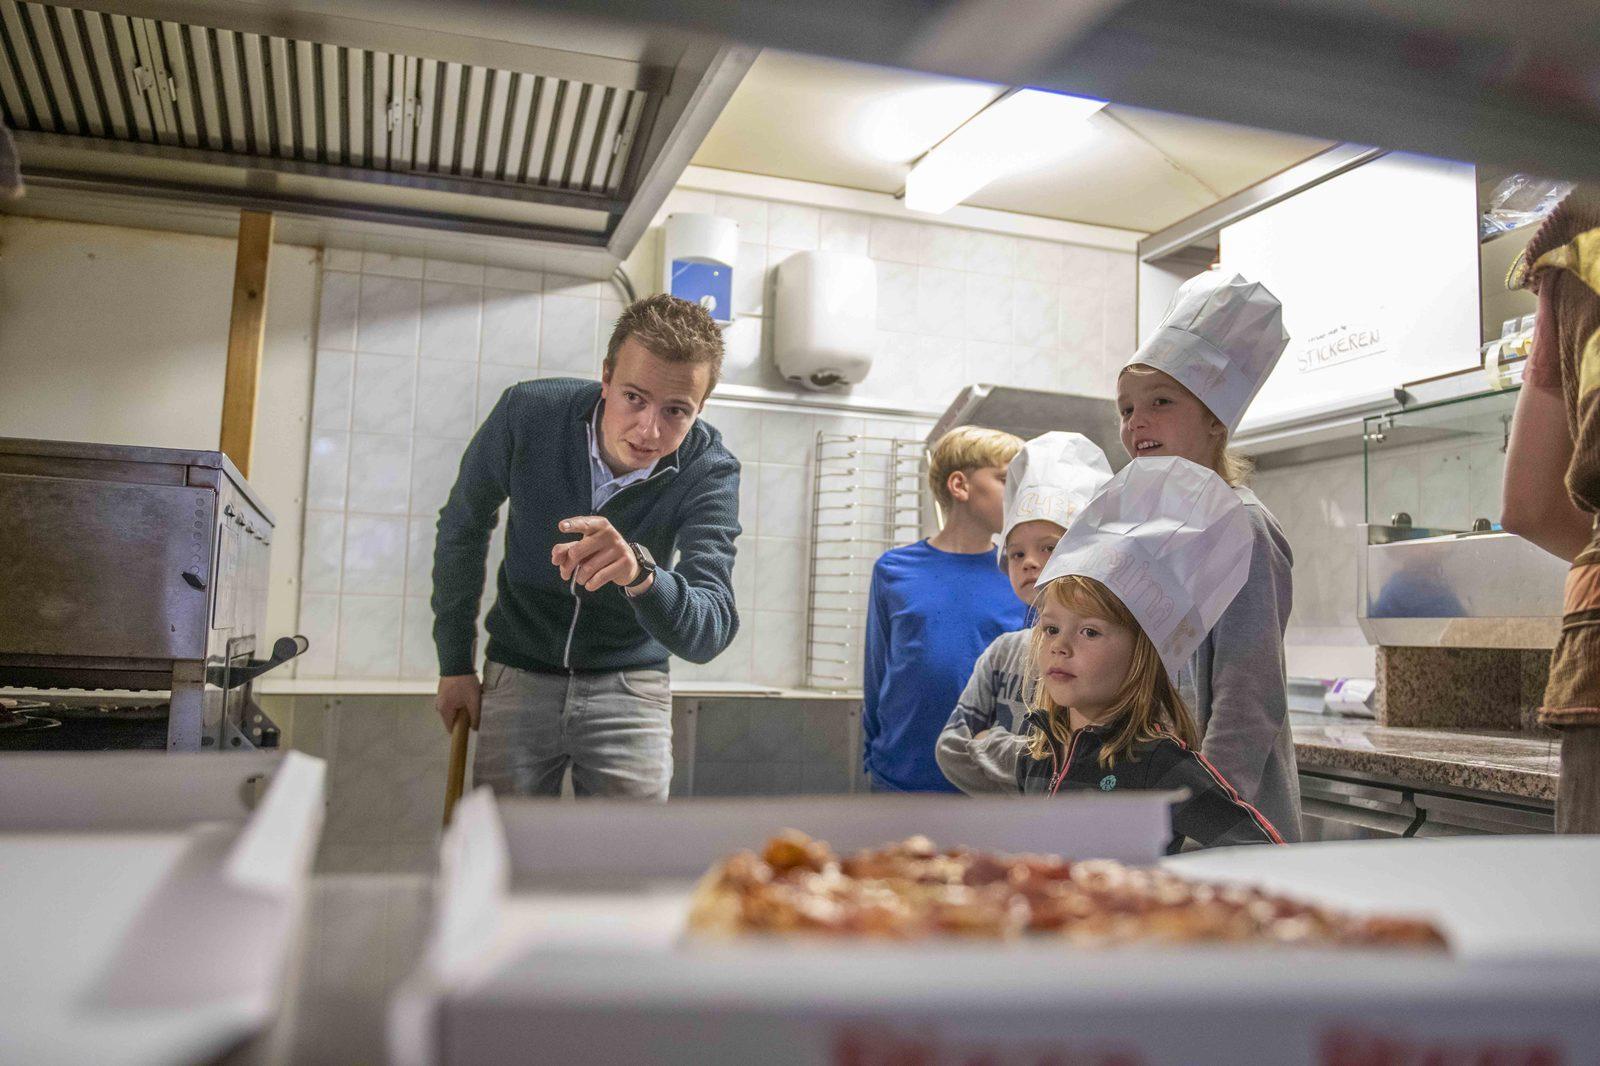 Kinderfeestje Bak je eigen Pizza | Kampeerdorp de Zandstuve